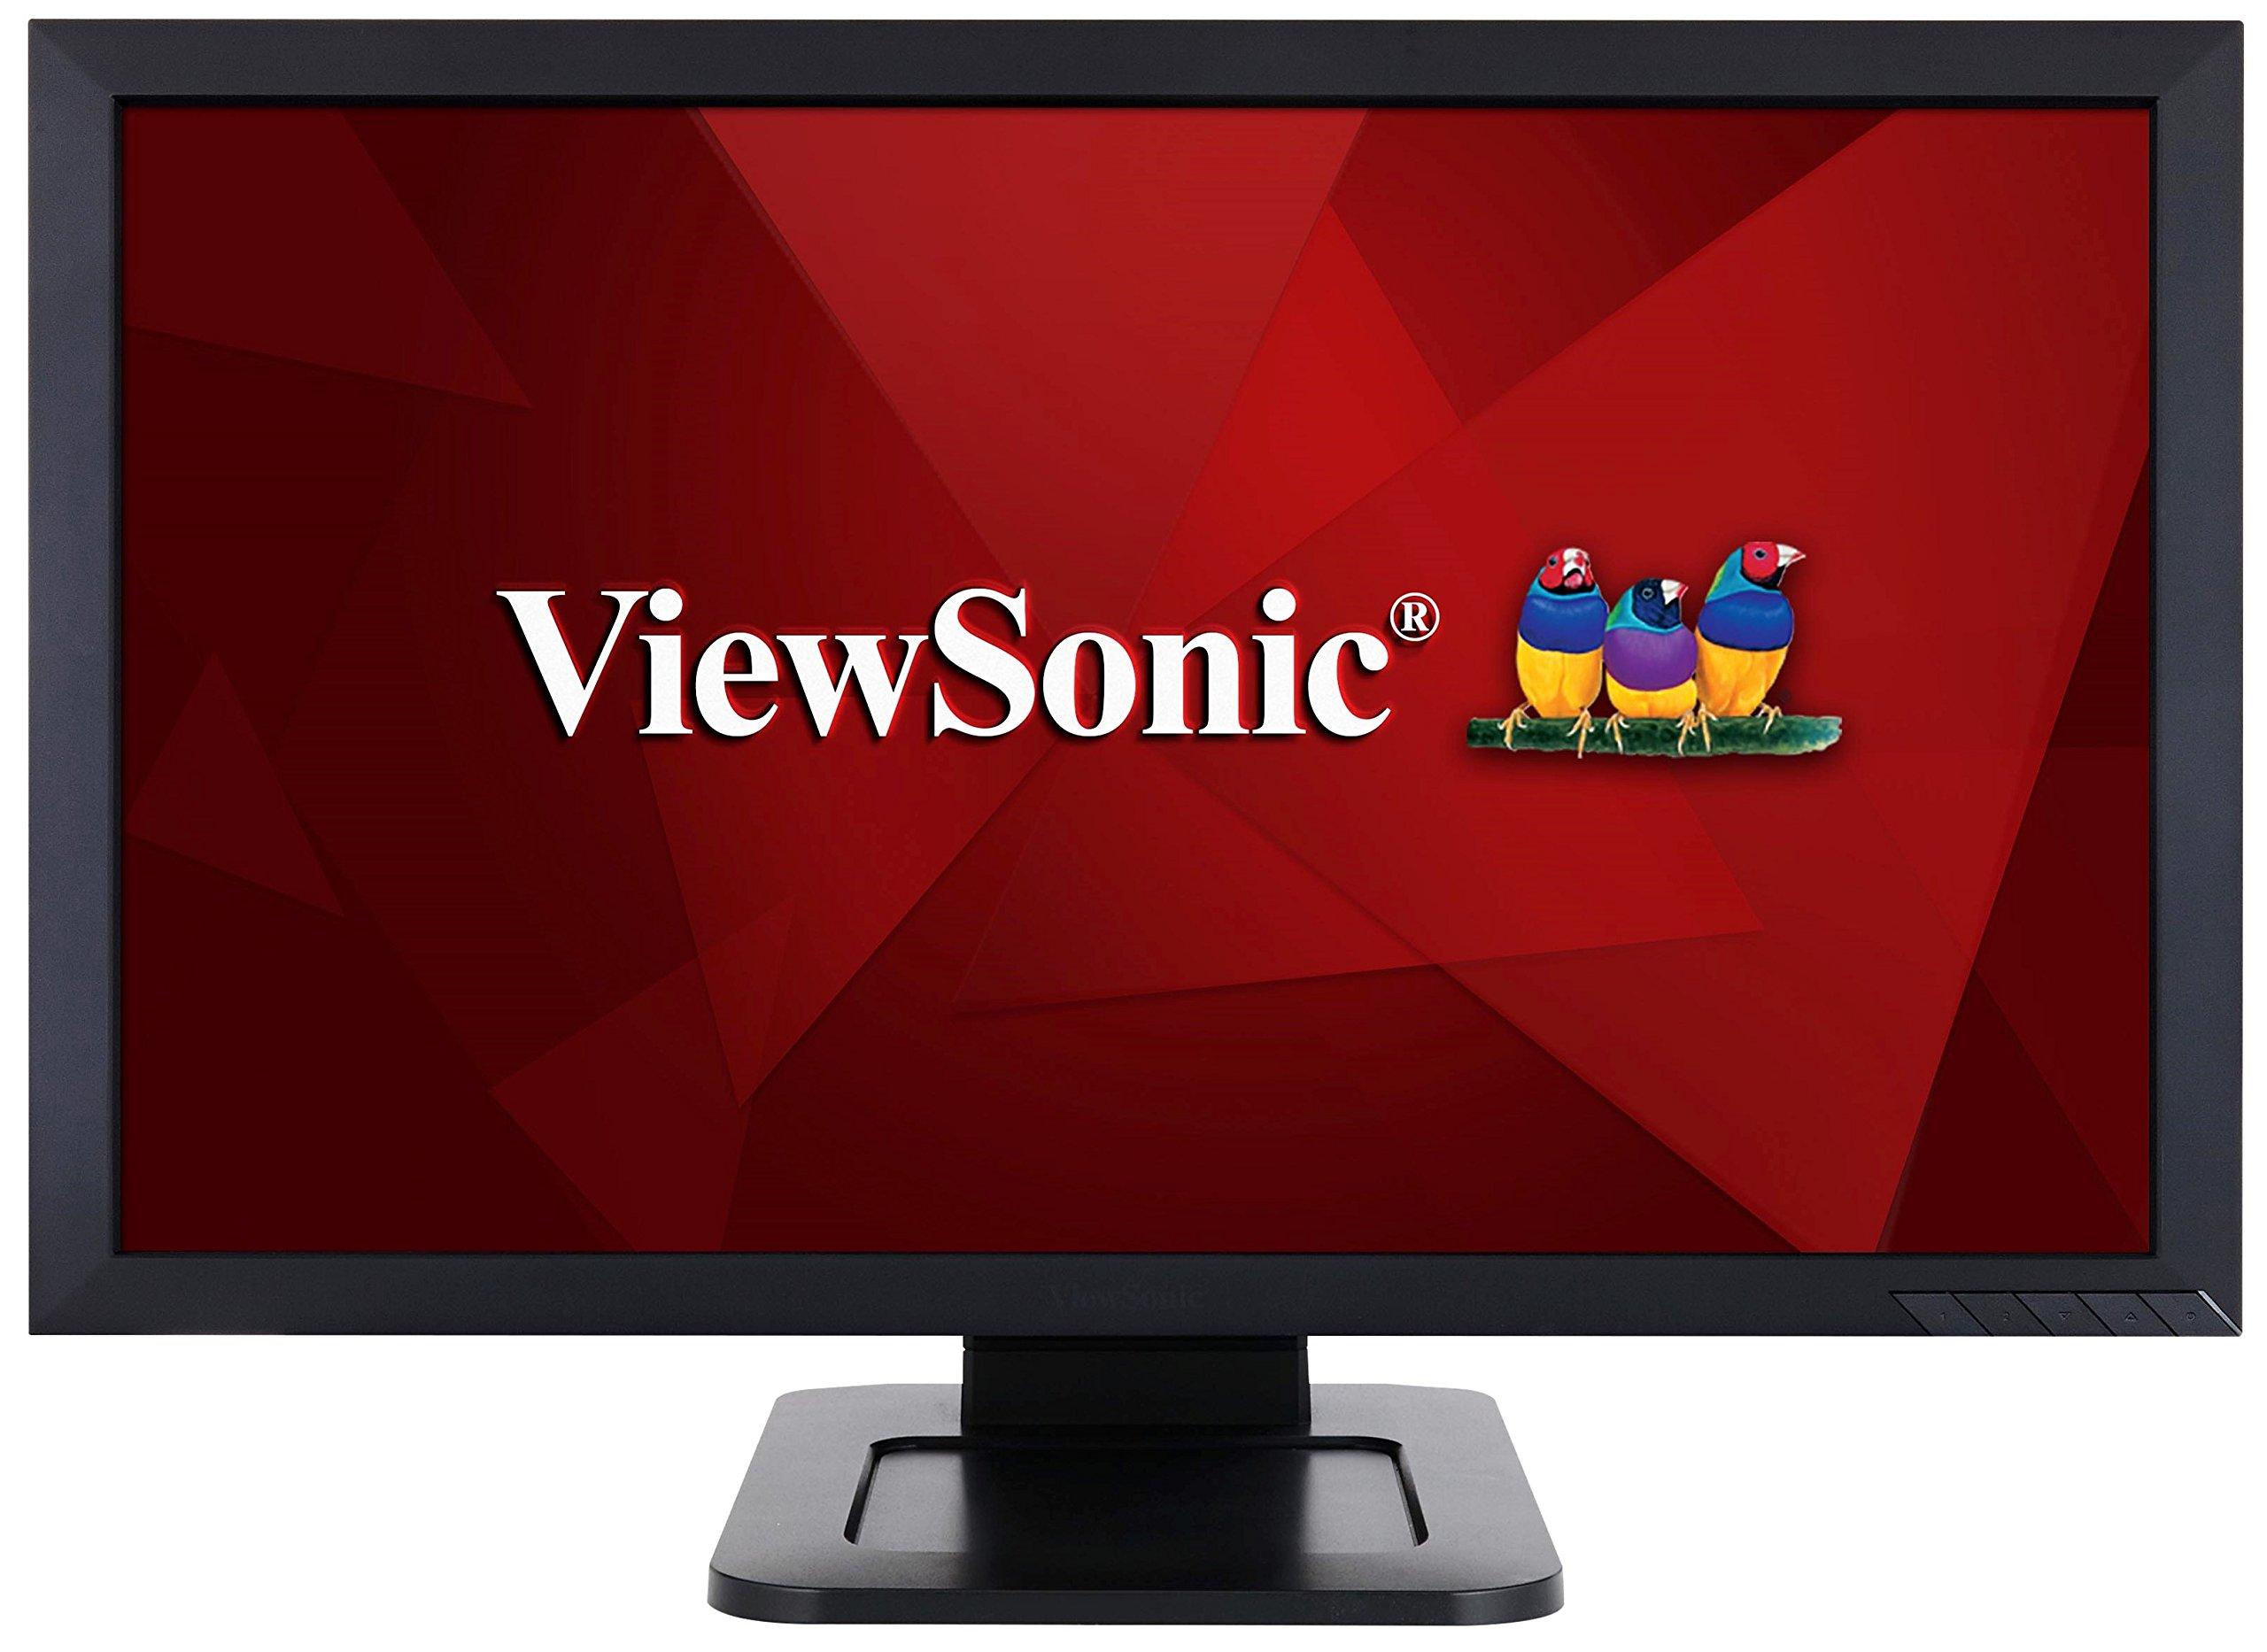 ViewSonic TD2421 Dual Point Optical Monitor